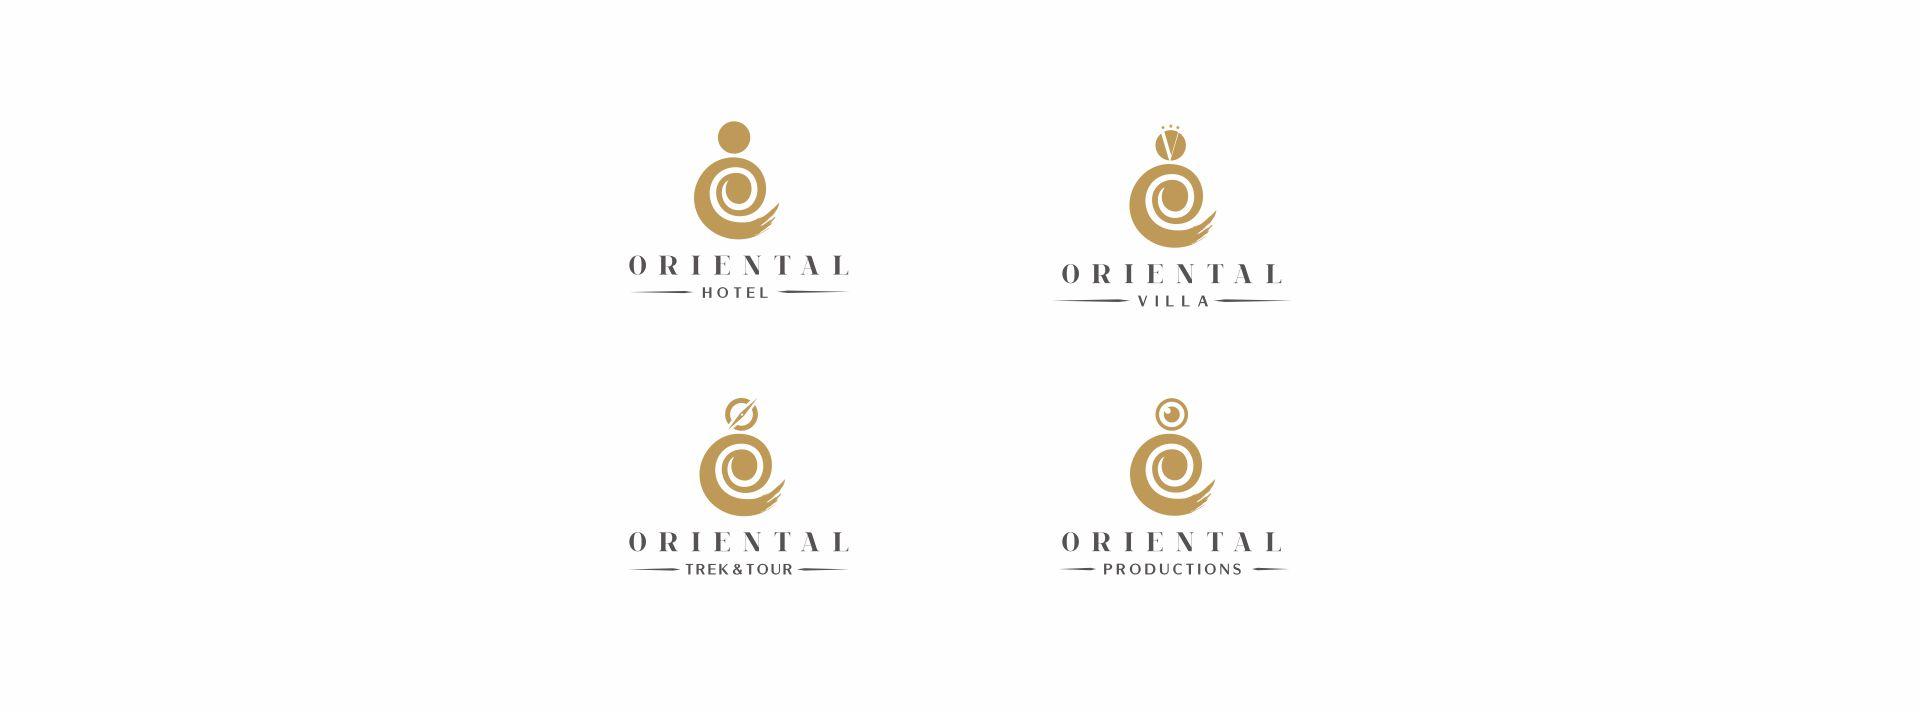 best logo design company ladakh